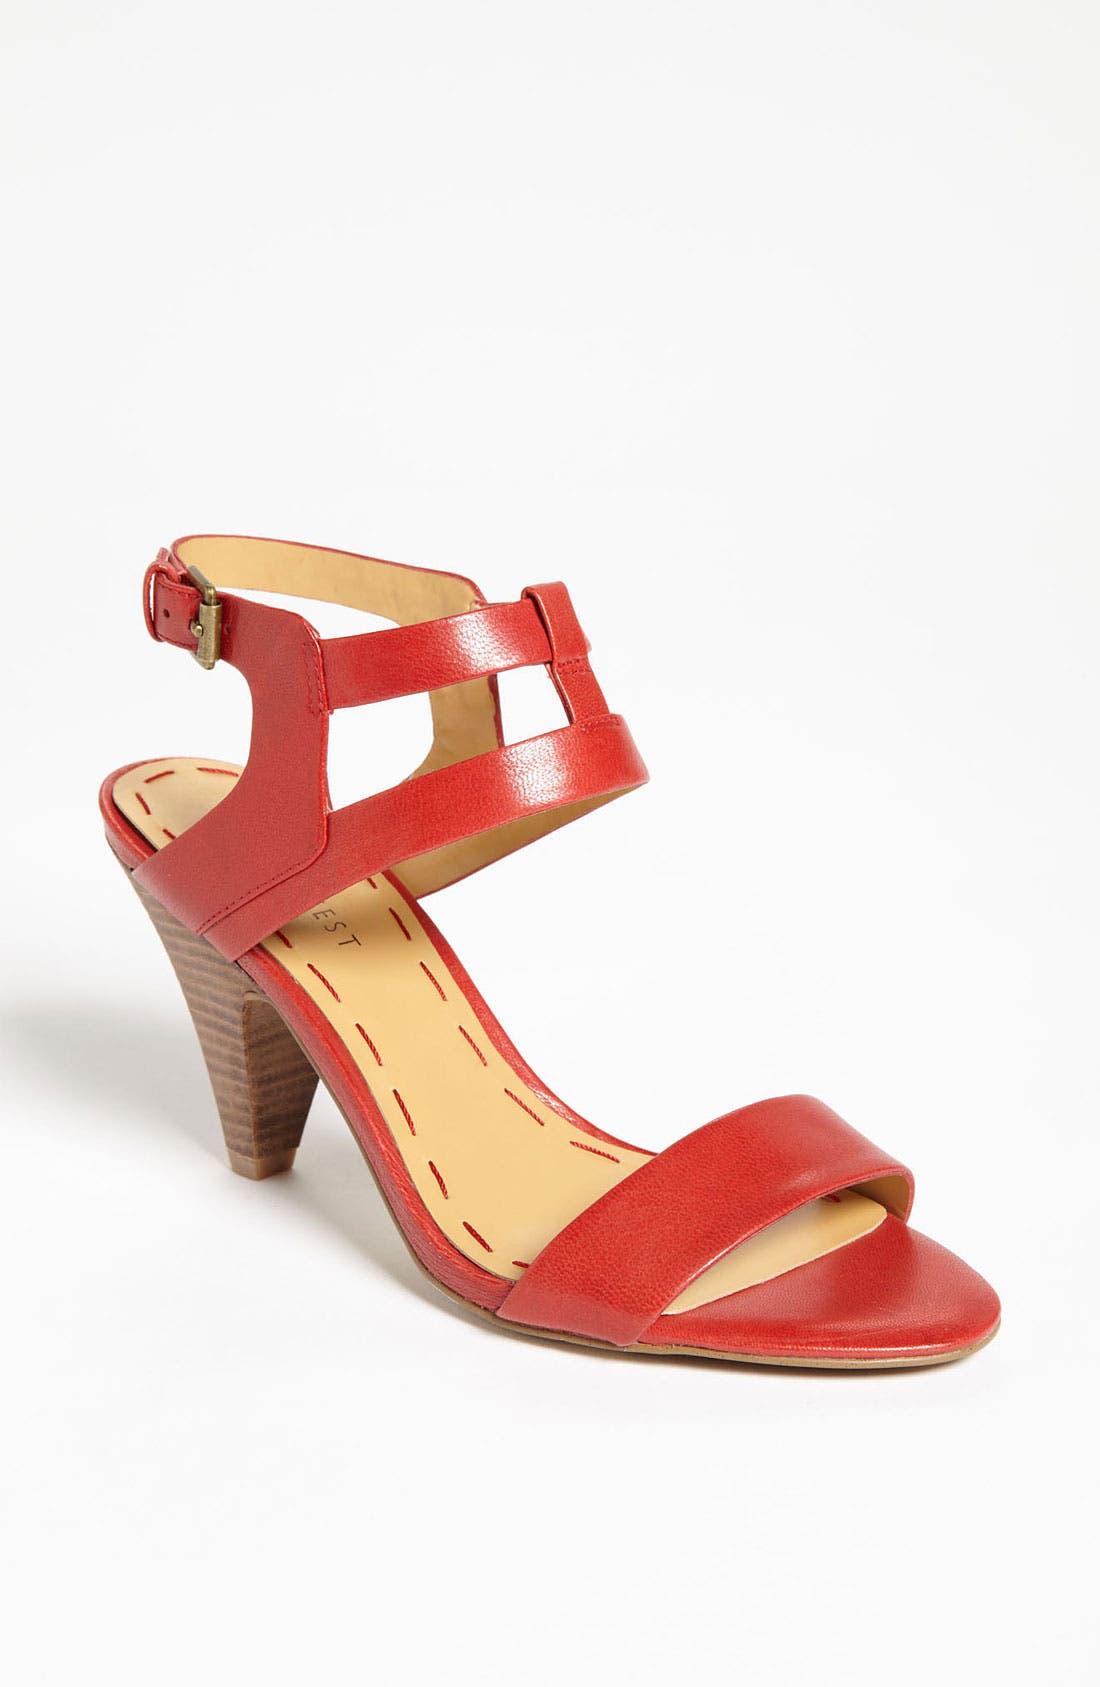 Alternate Image 1 Selected - Nine West 'Catatude' Sandal